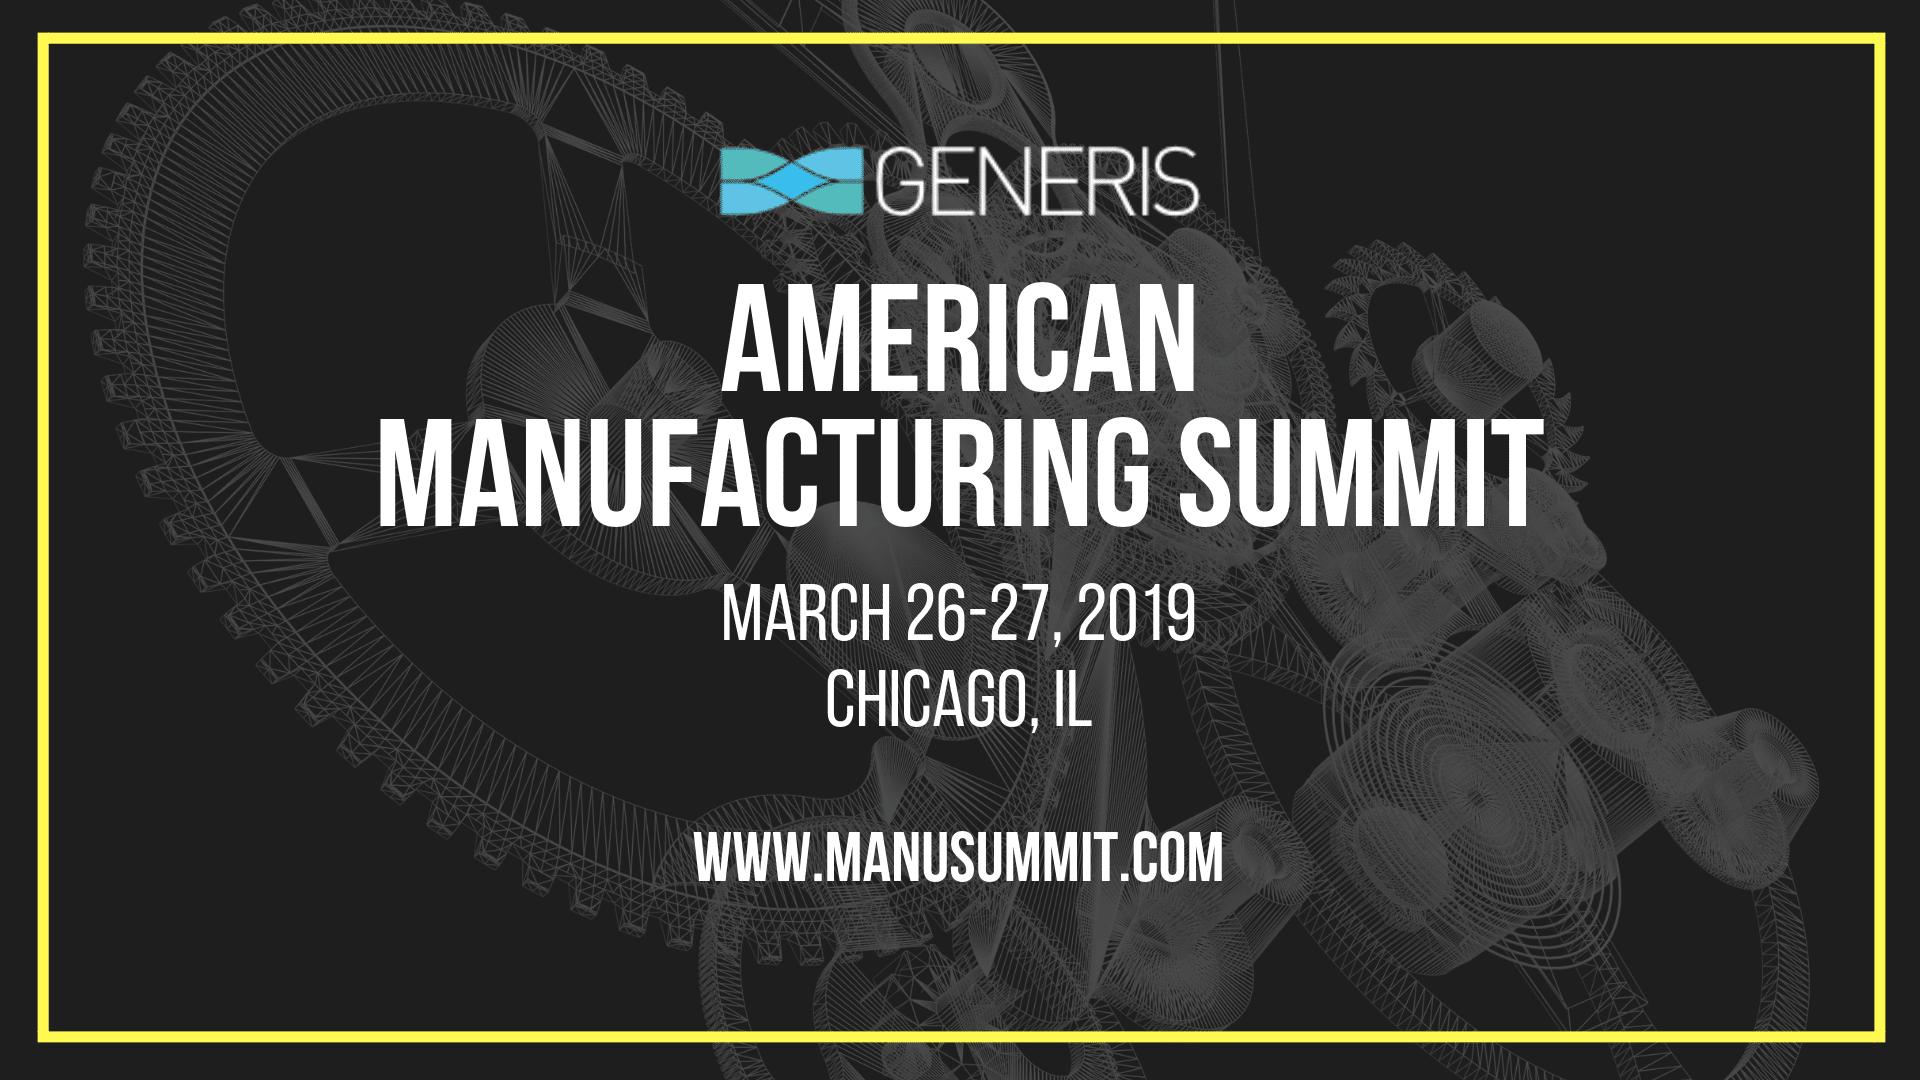 American Manufacturing Summit 2020 | Generis Group